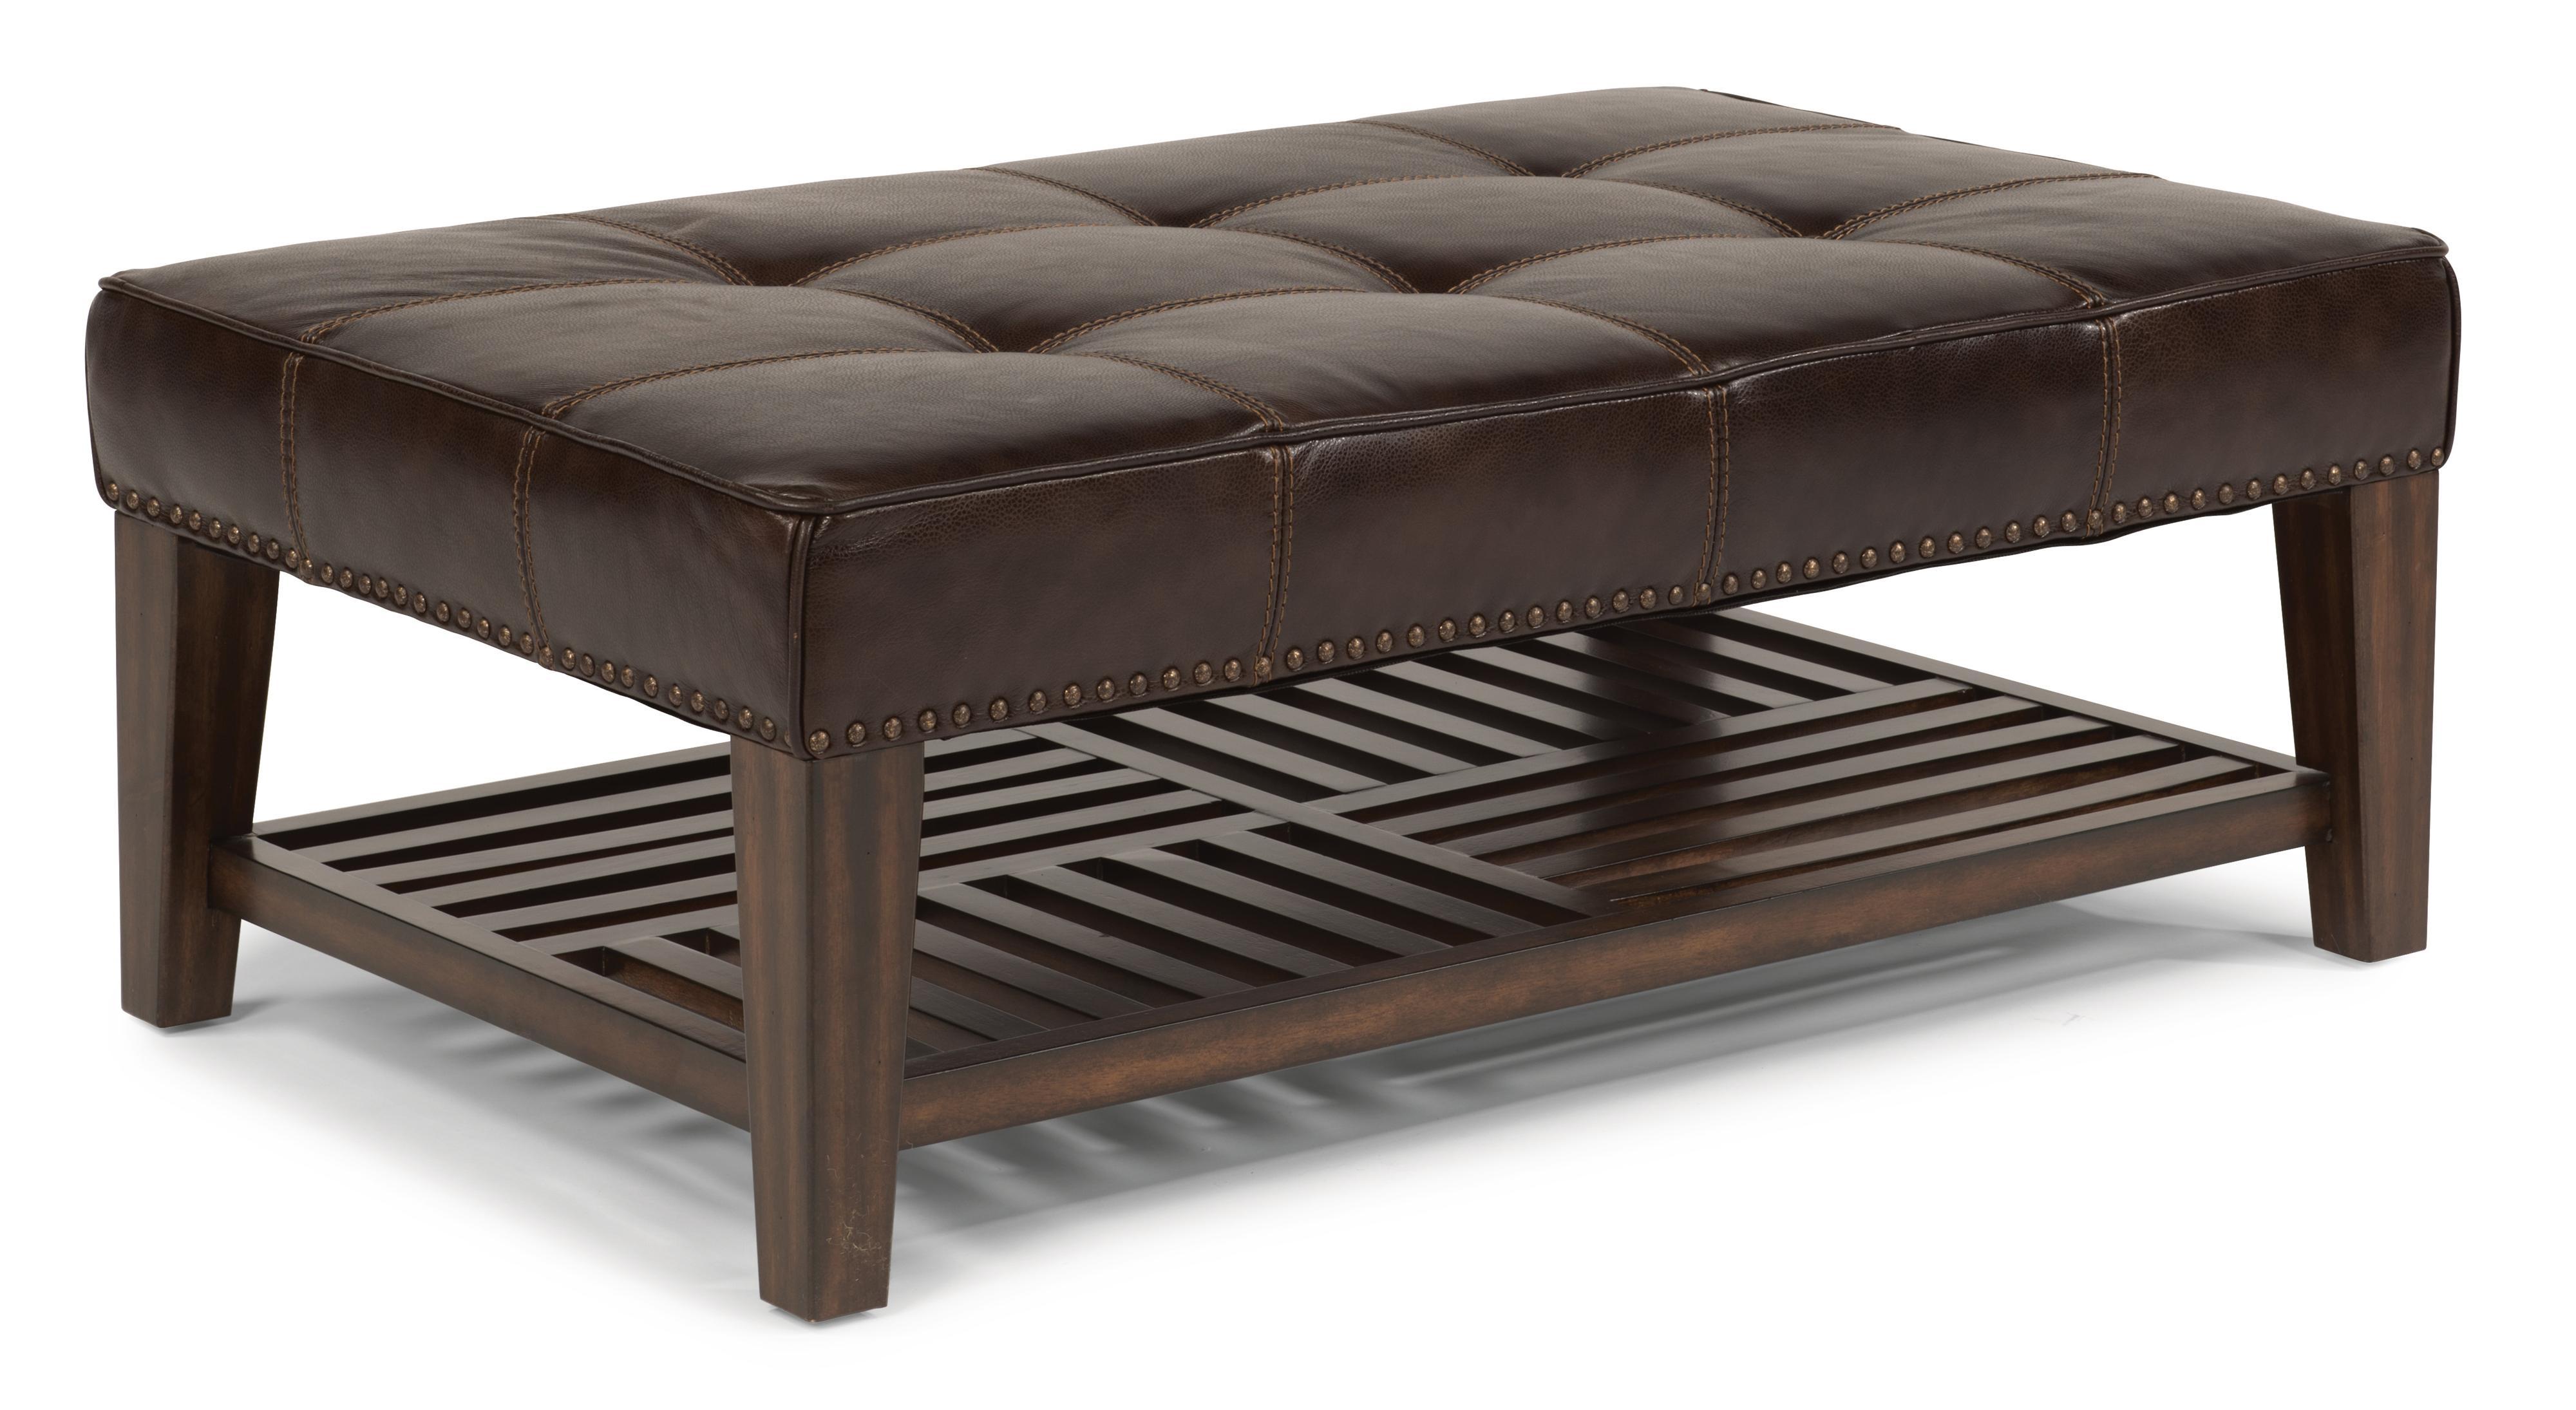 Latitudes - Port Royal Upholstered Cocktail Ottoman by Flexsteel at Walker's Furniture